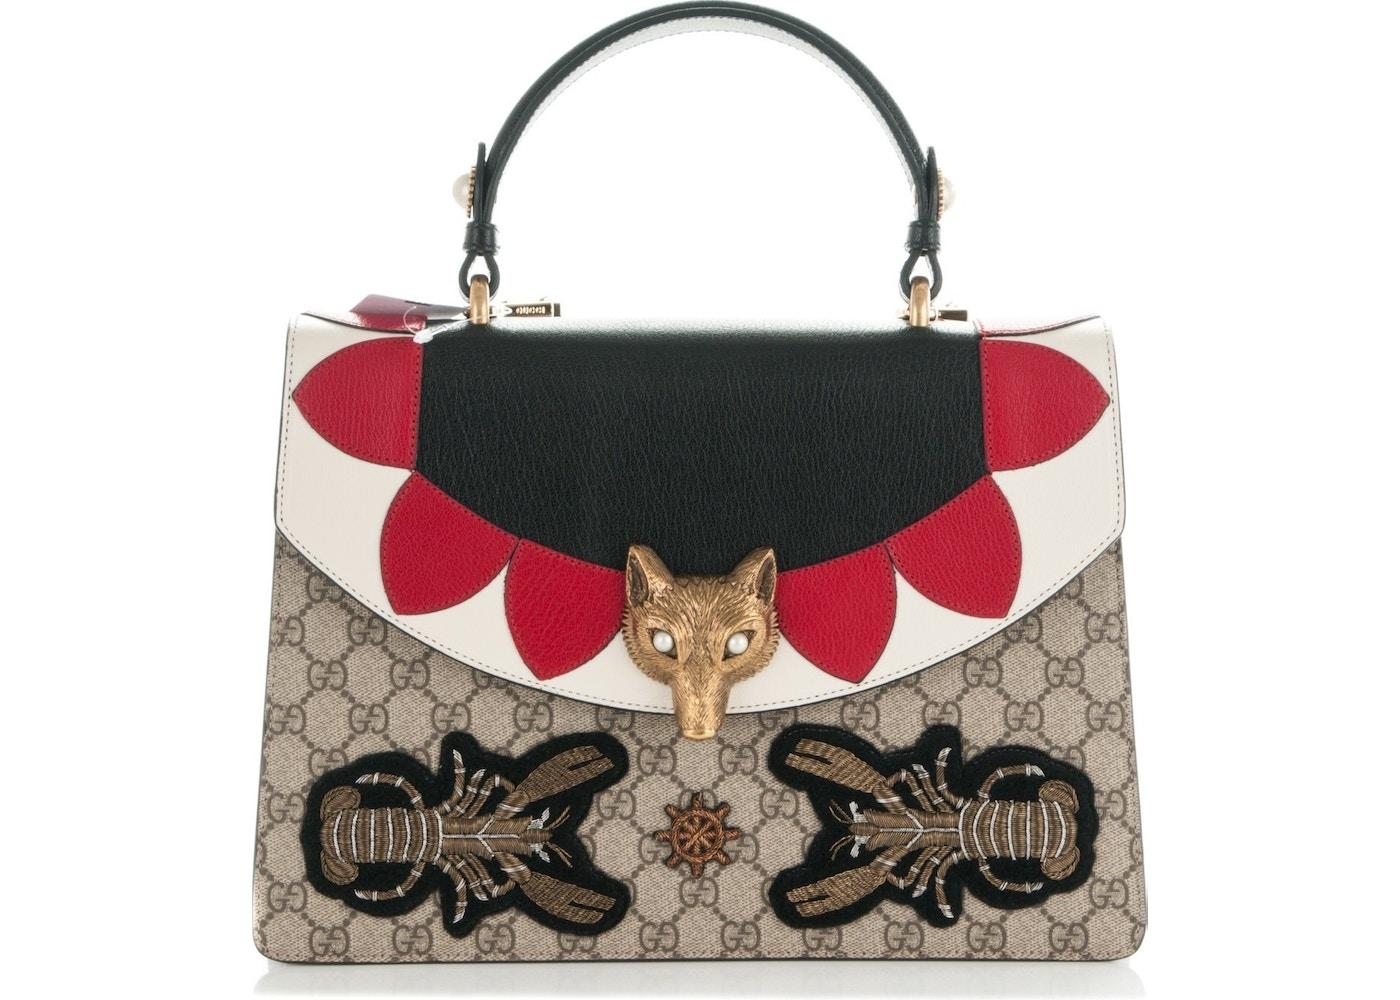 51089816720b Sell. or Ask. View All Bids. Gucci Fox Broche Shoulder Monogram GG Supreme  ...